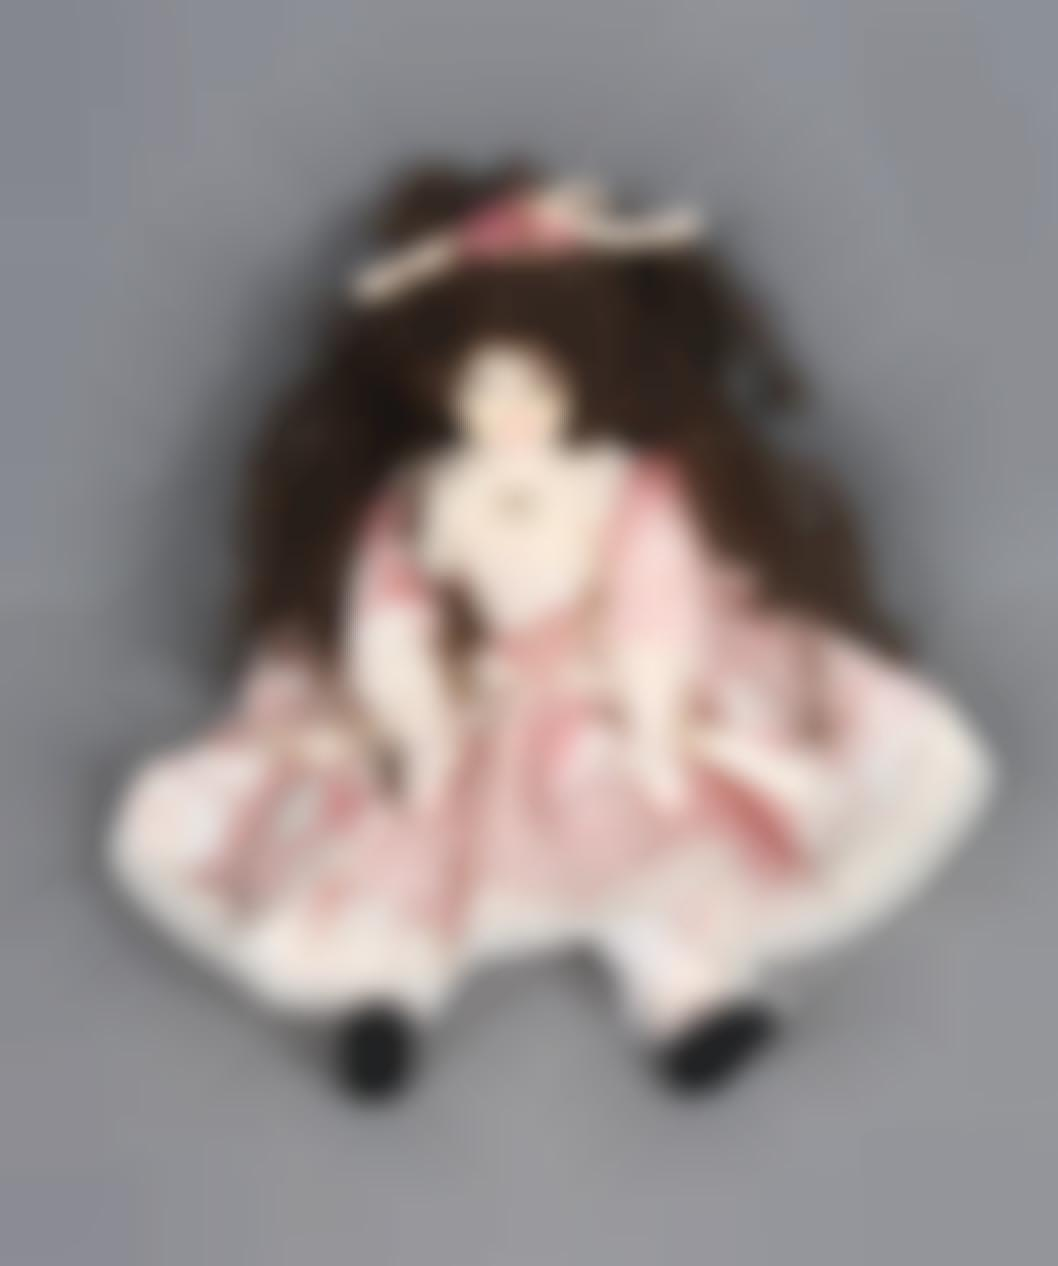 A Porcelain Doll-